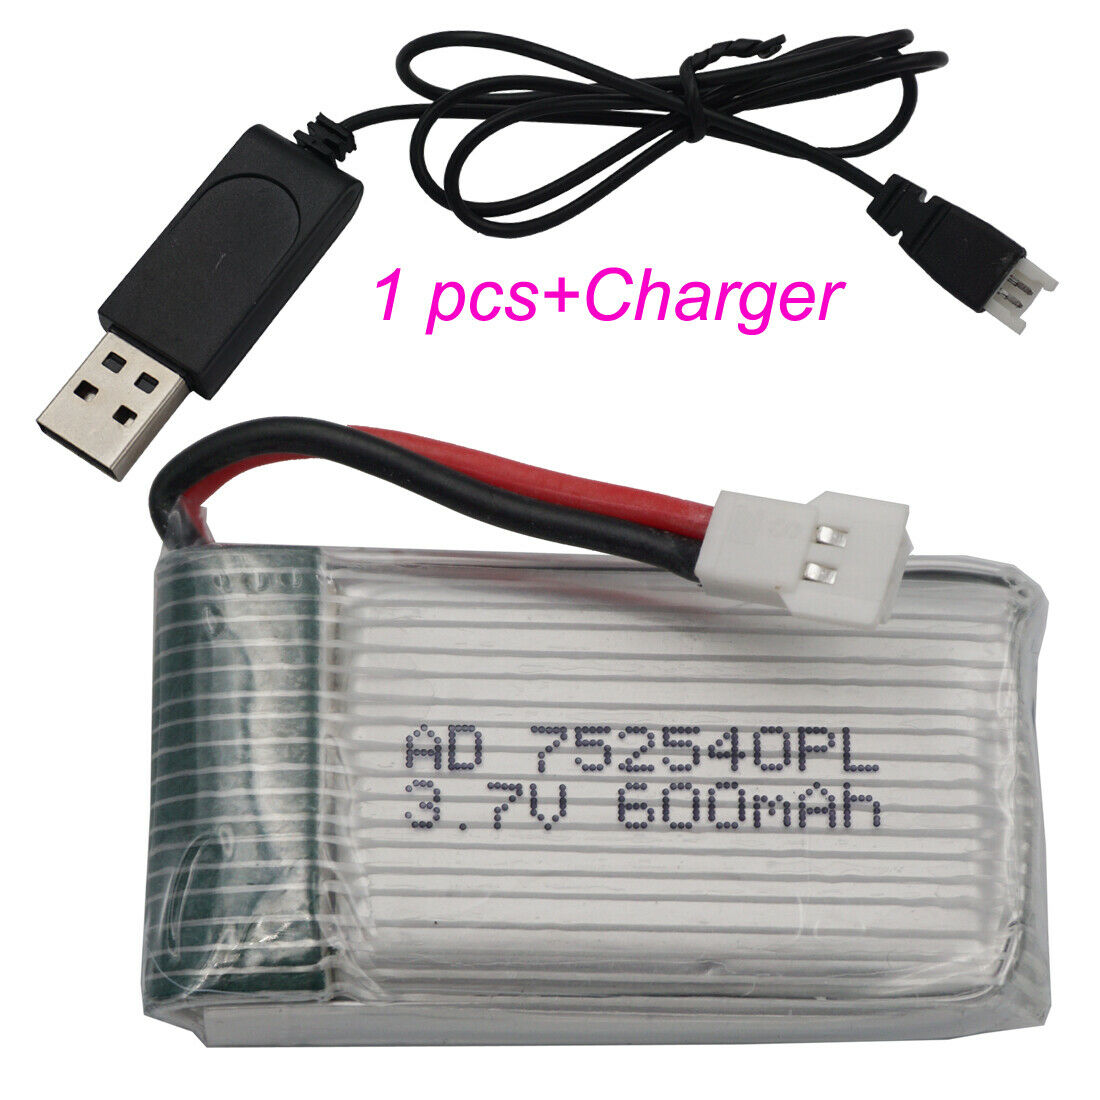 3.7V 600mAh 25C 25C 25C Polymer Li ion battery 752540 for Syma X5C Quadrocopter original 441983